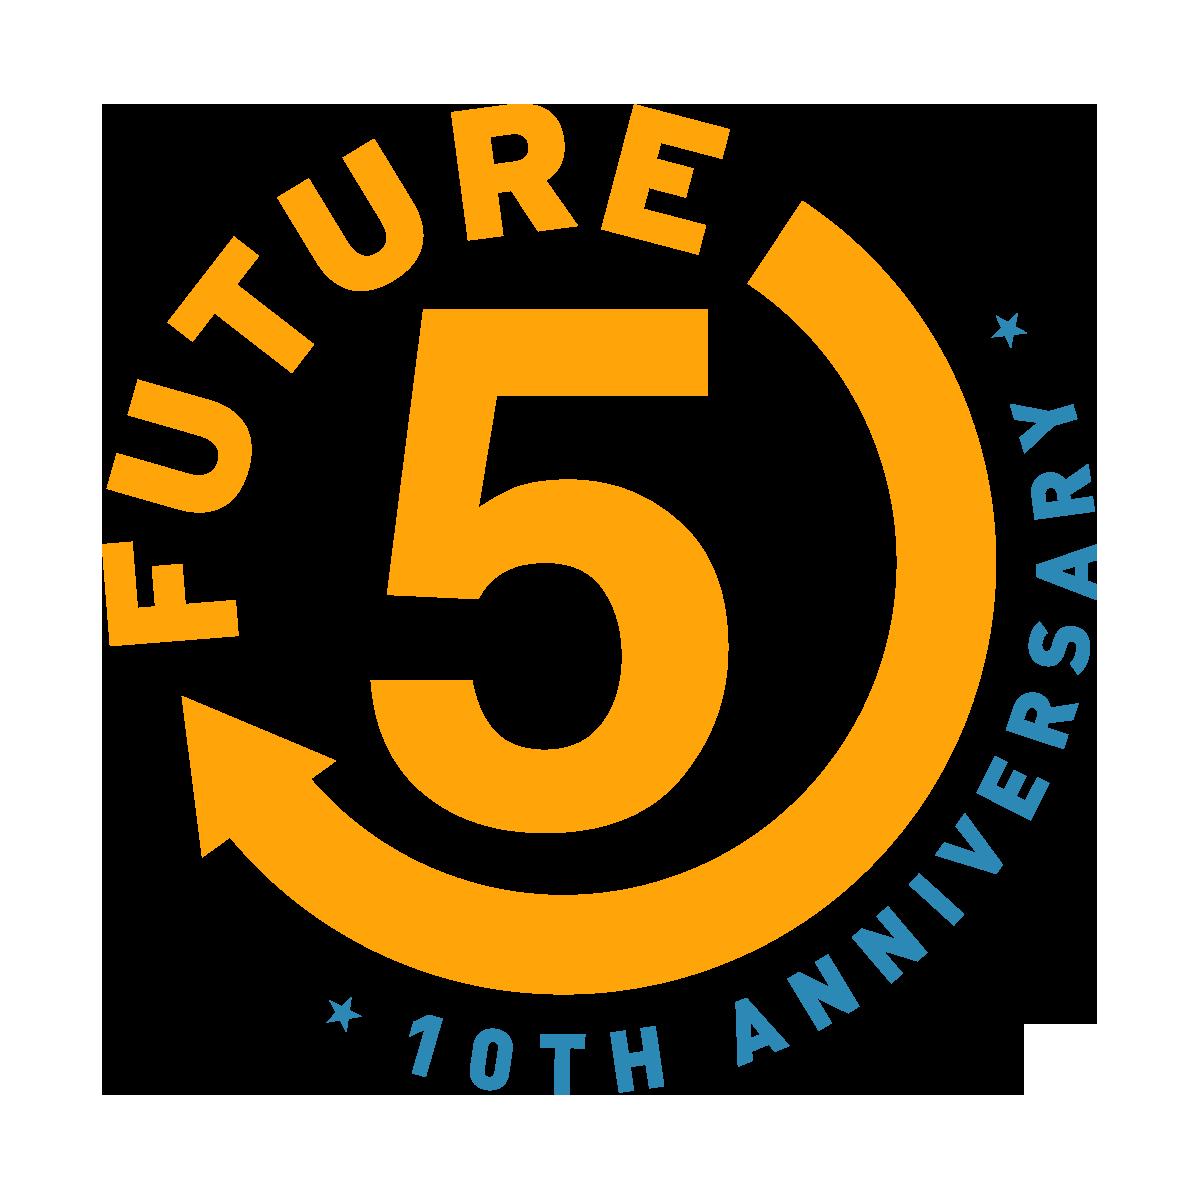 future-5-10th-anniversary-logo.png